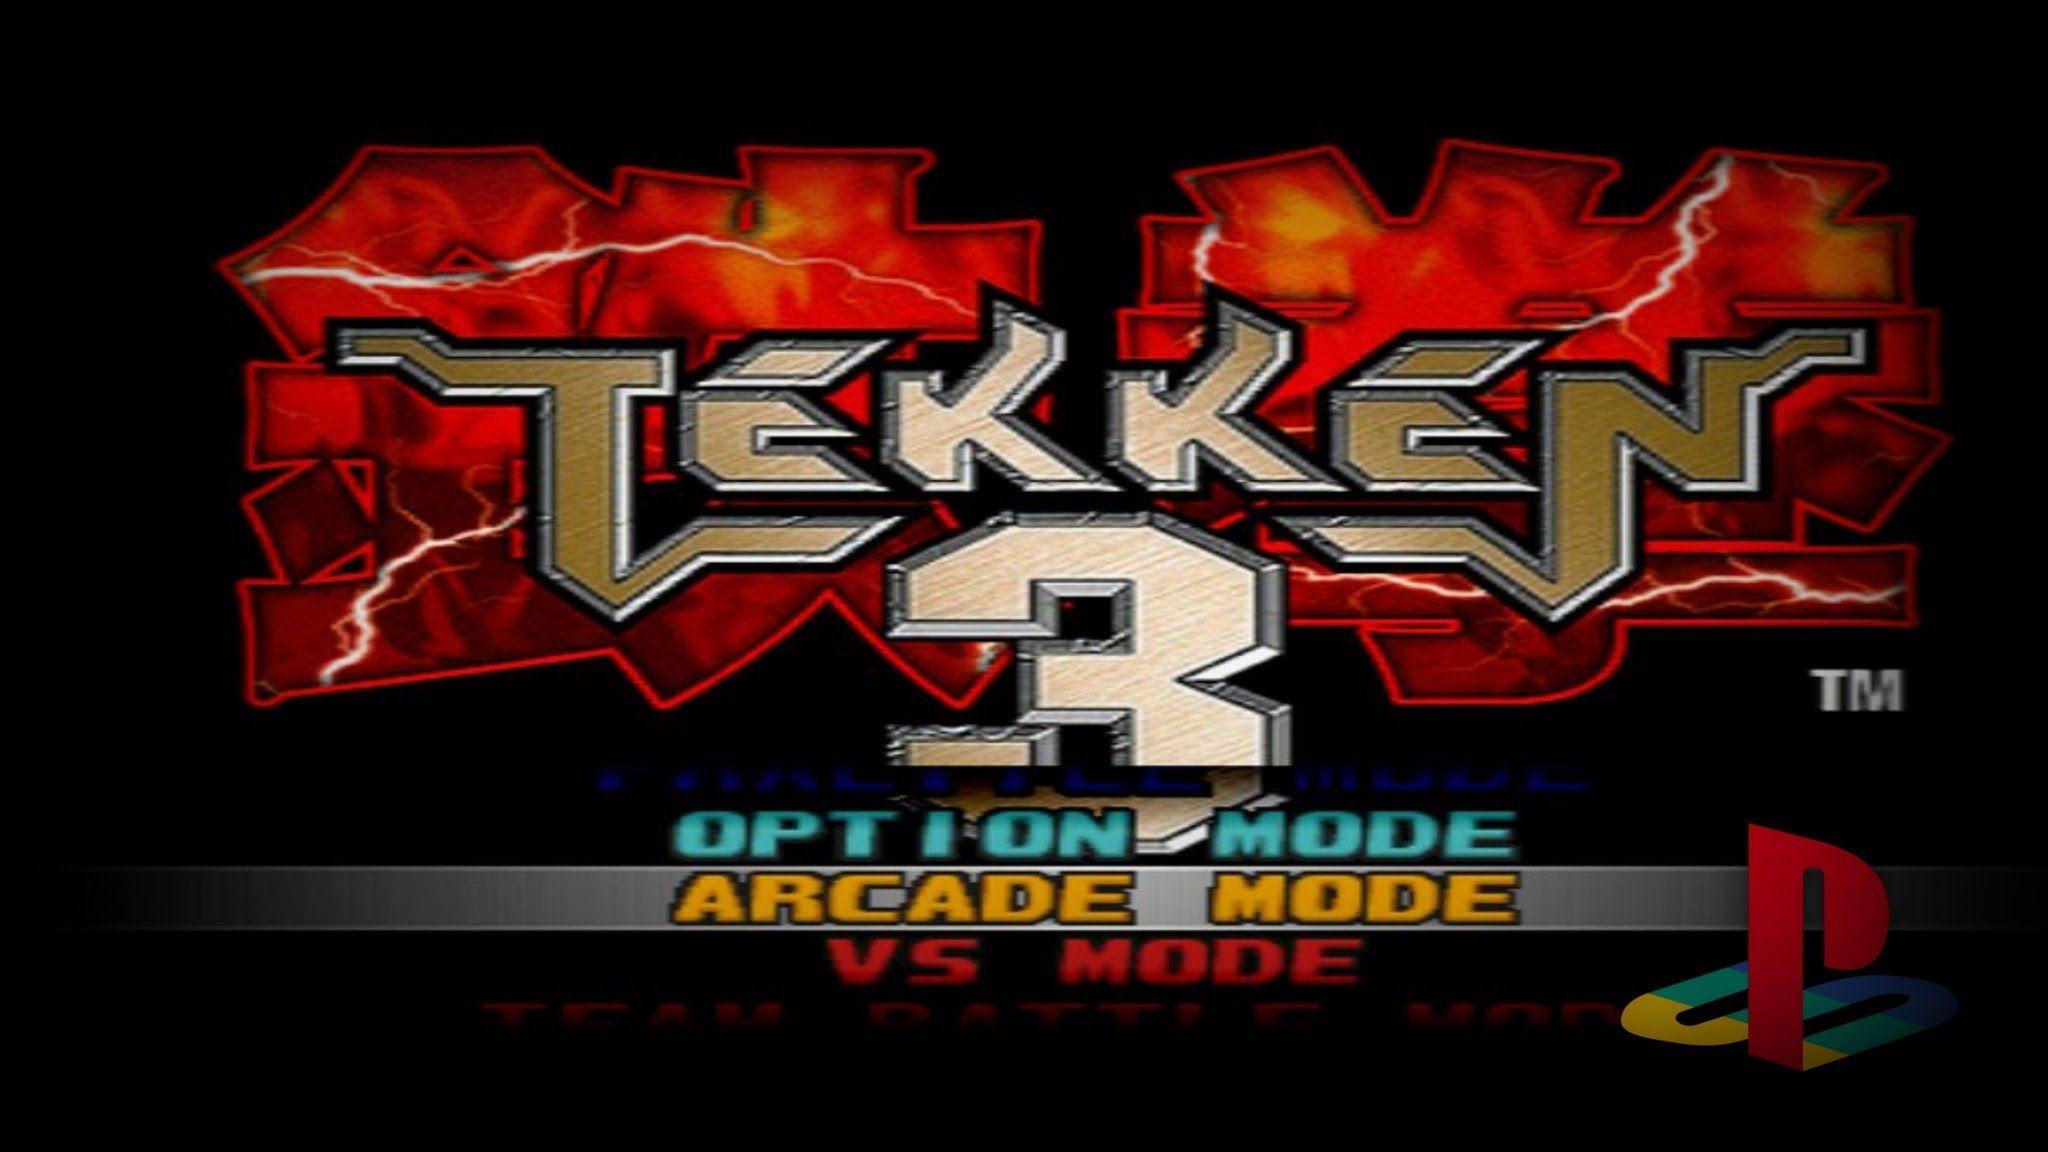 teken 3 menu screen (With images) Download games, Free